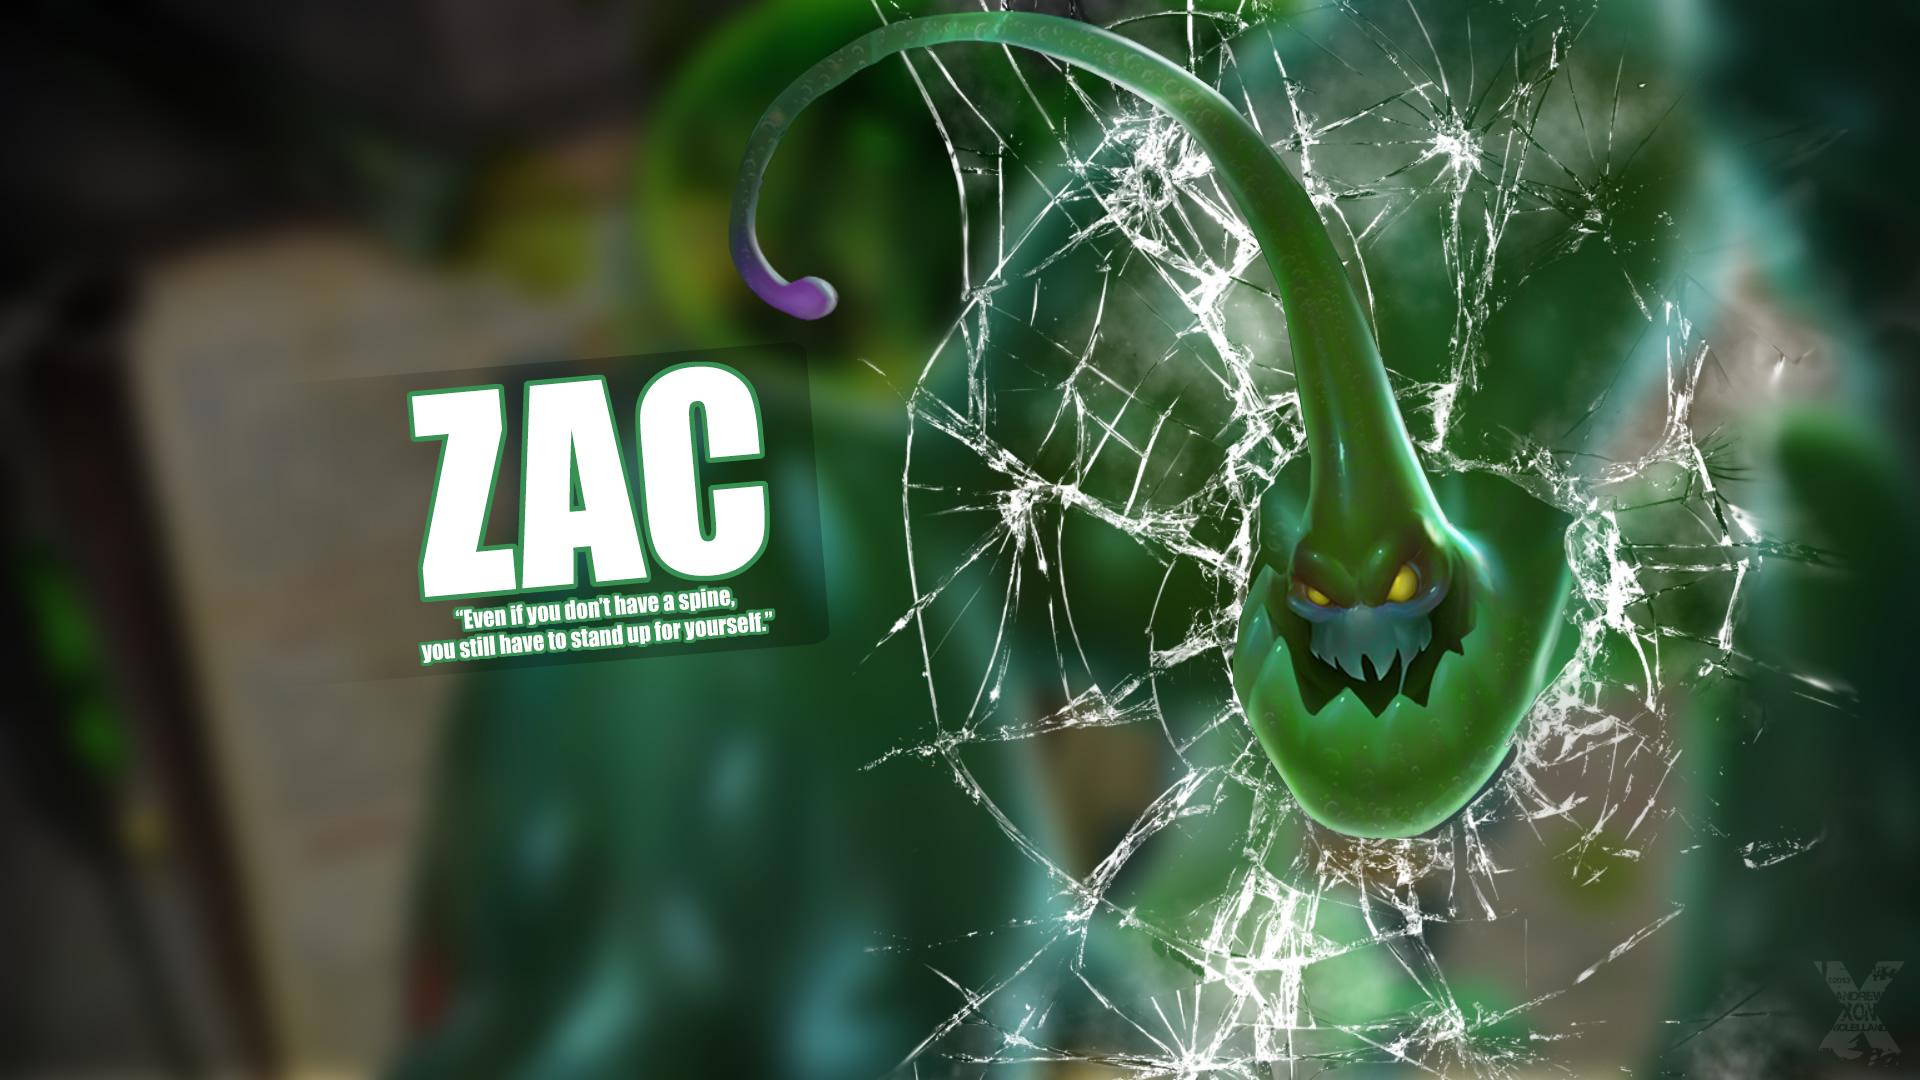 Zac League Of Legends Skins